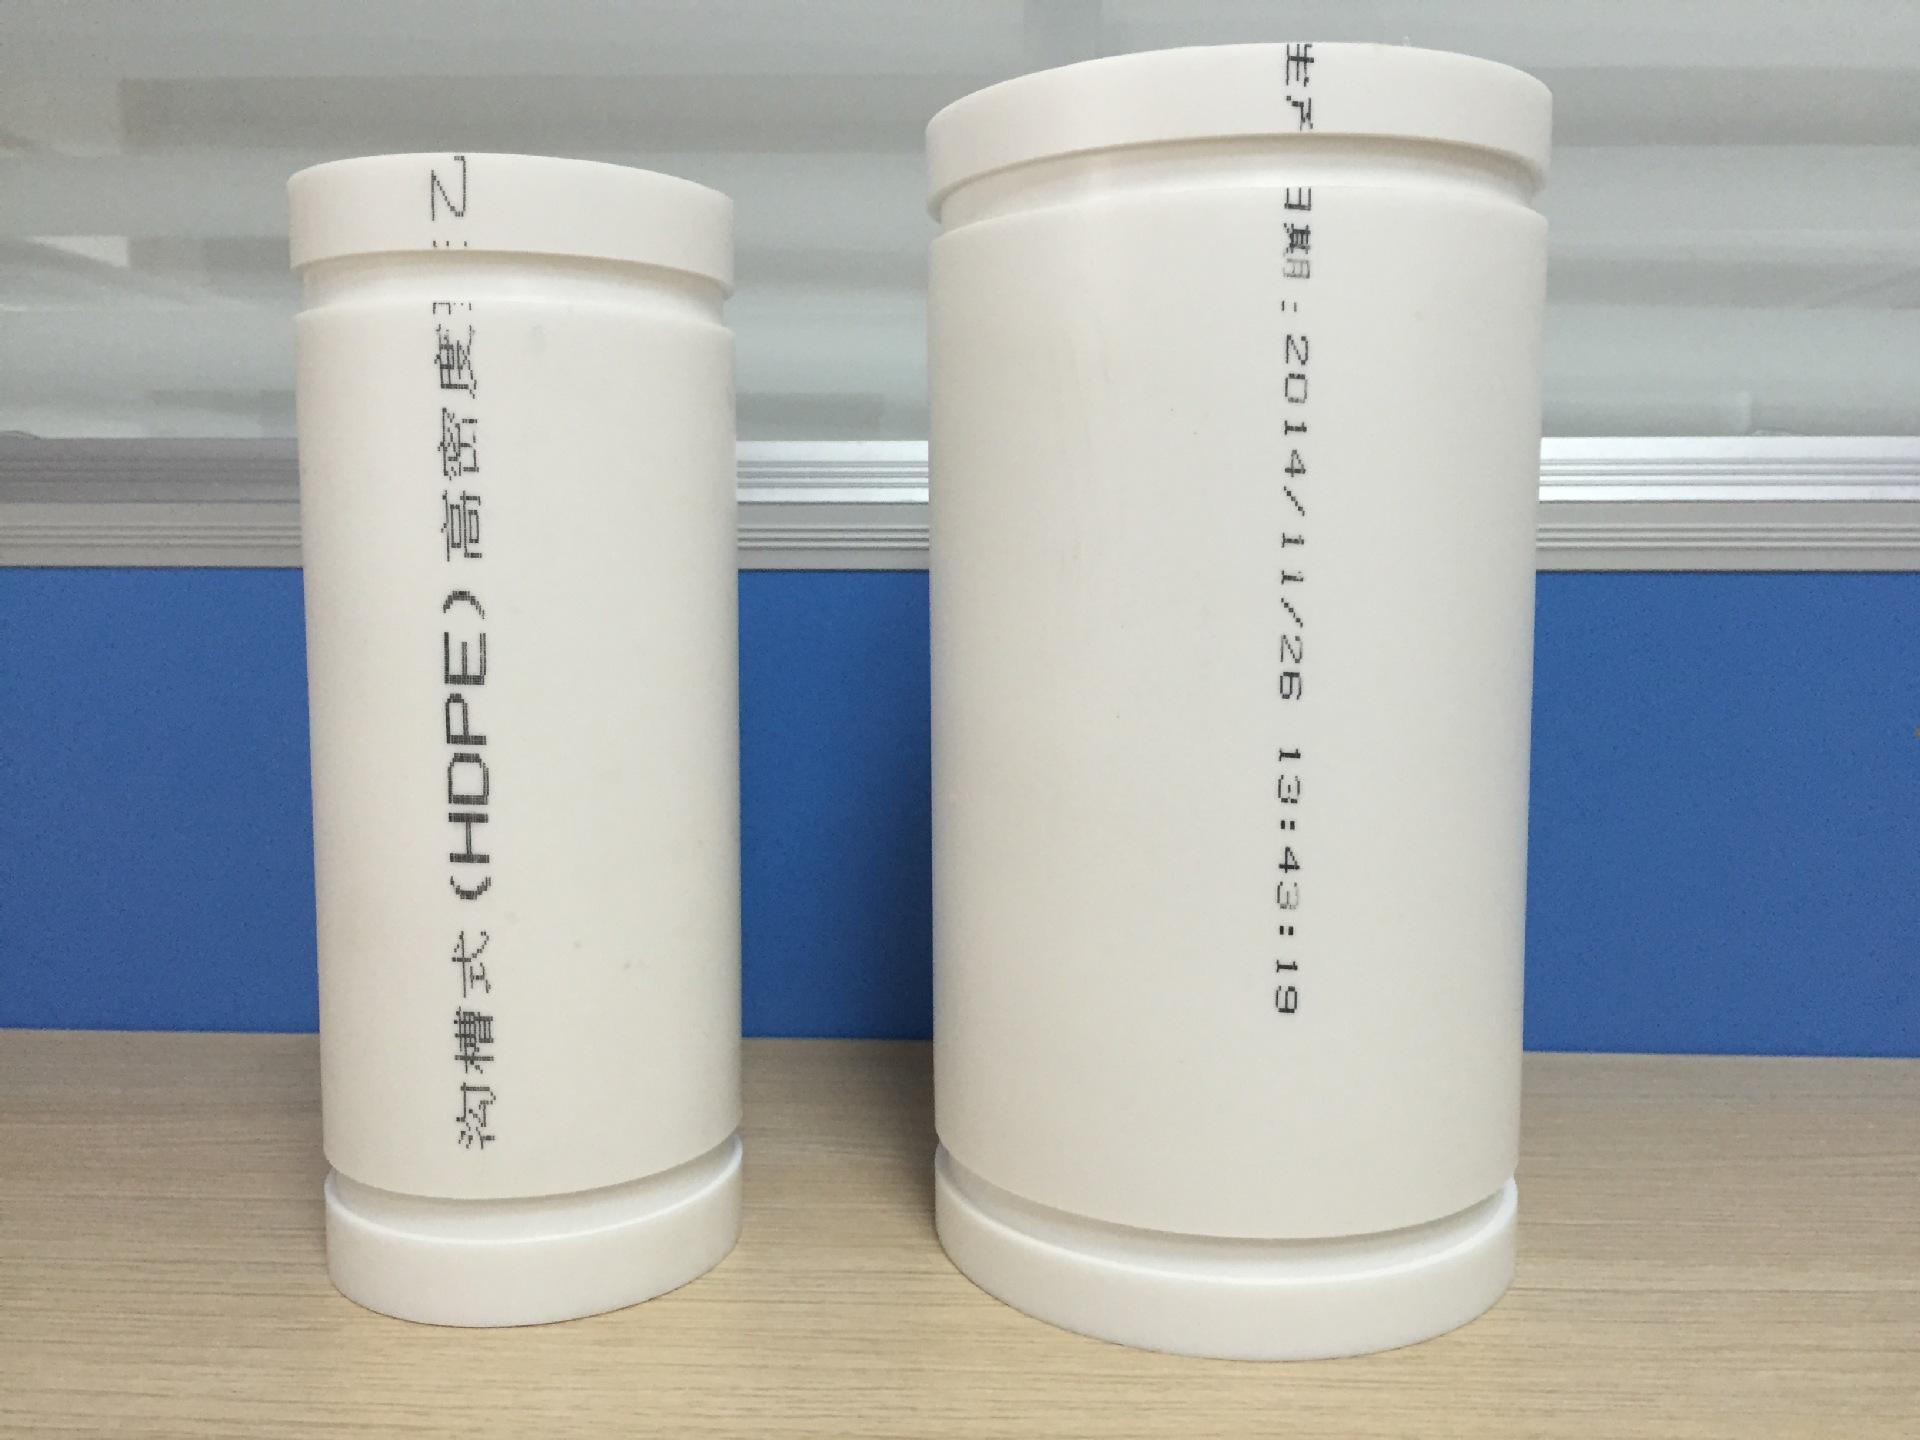 HDPE沟槽式超静音排水管,沟槽PE排水管,HDPE沟槽管,PP静音管示例图7